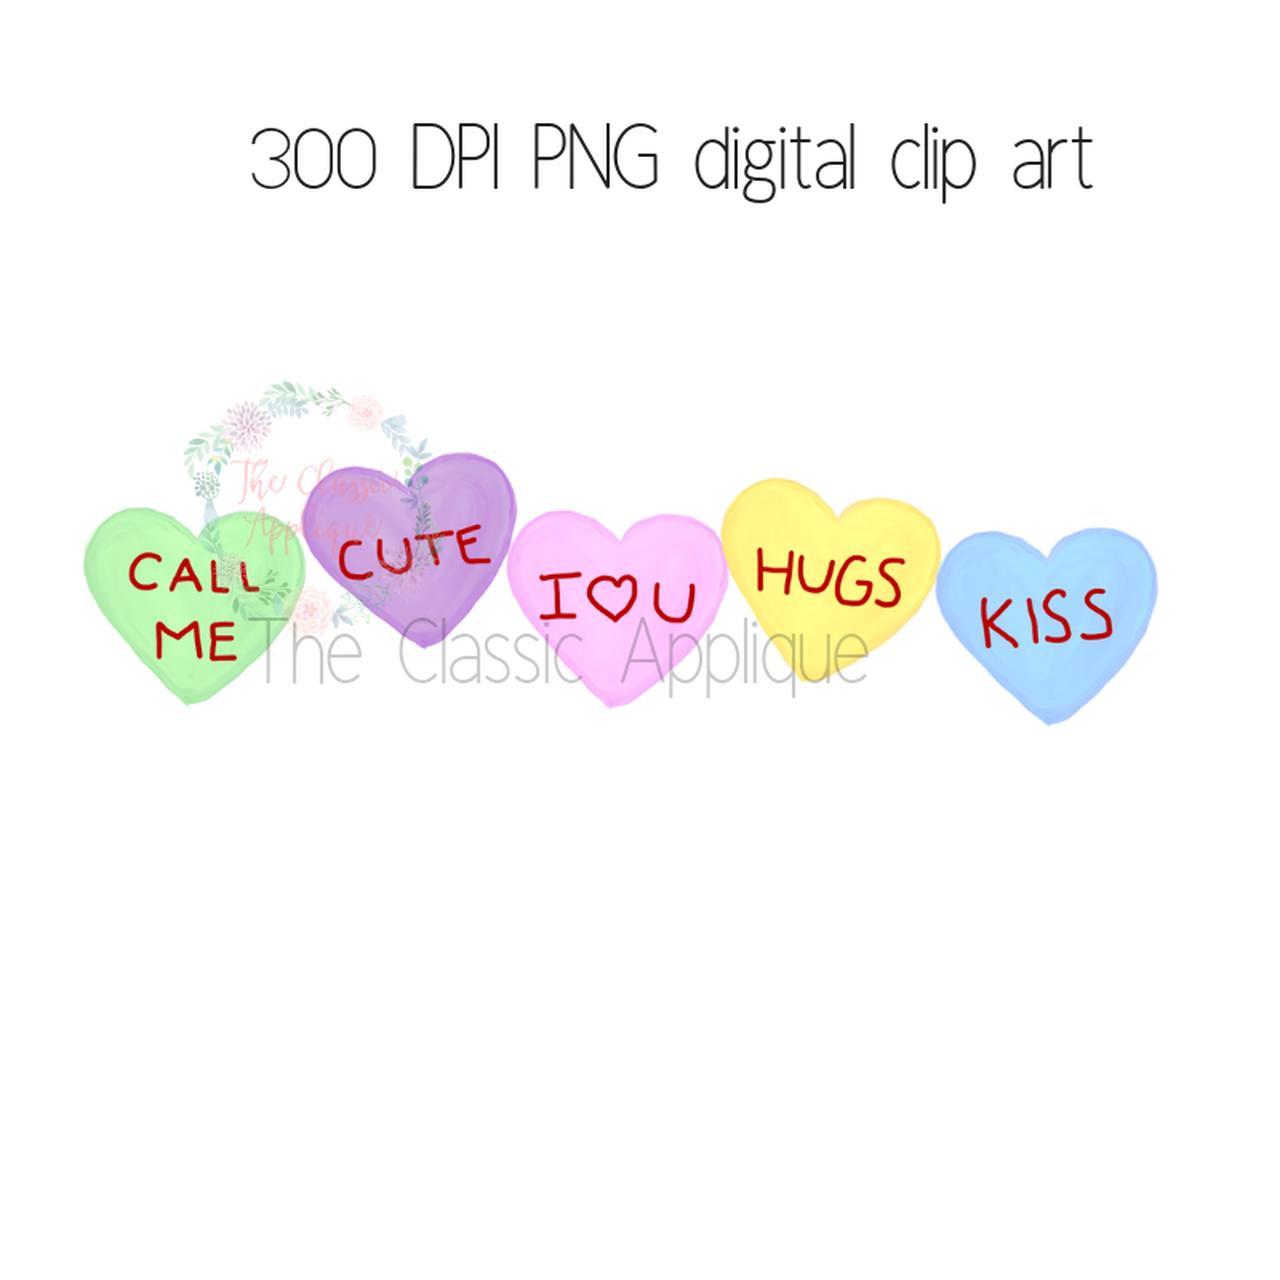 Conversation hearts watercolor PNG digital clip art file.